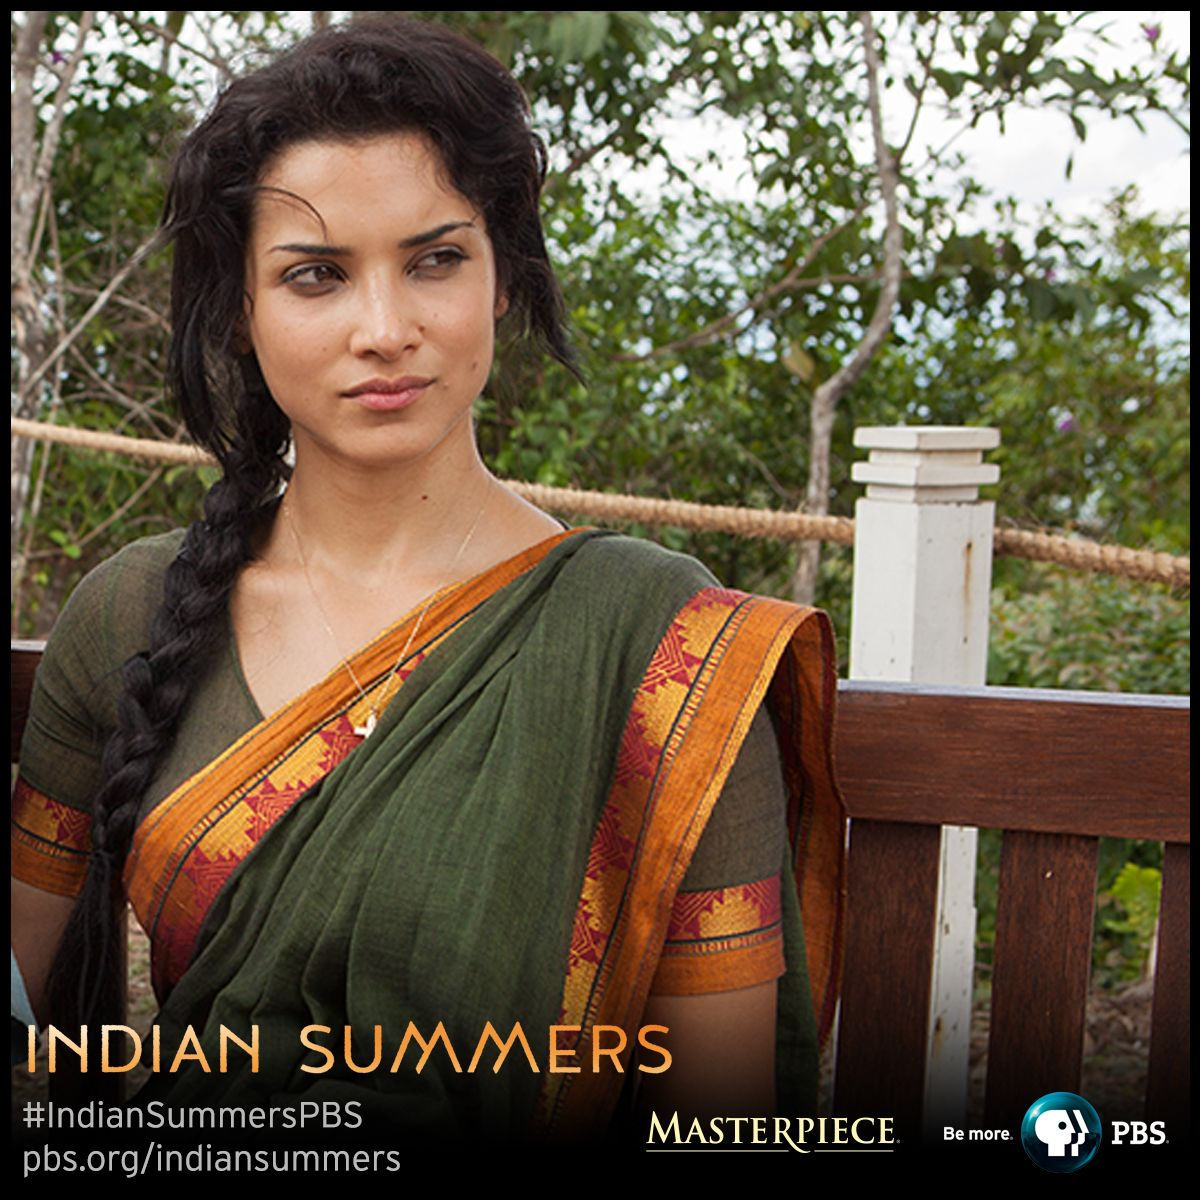 Leena Prasad (amber Rose Revah)  Indian Summers, As Seen On Masterpiece On